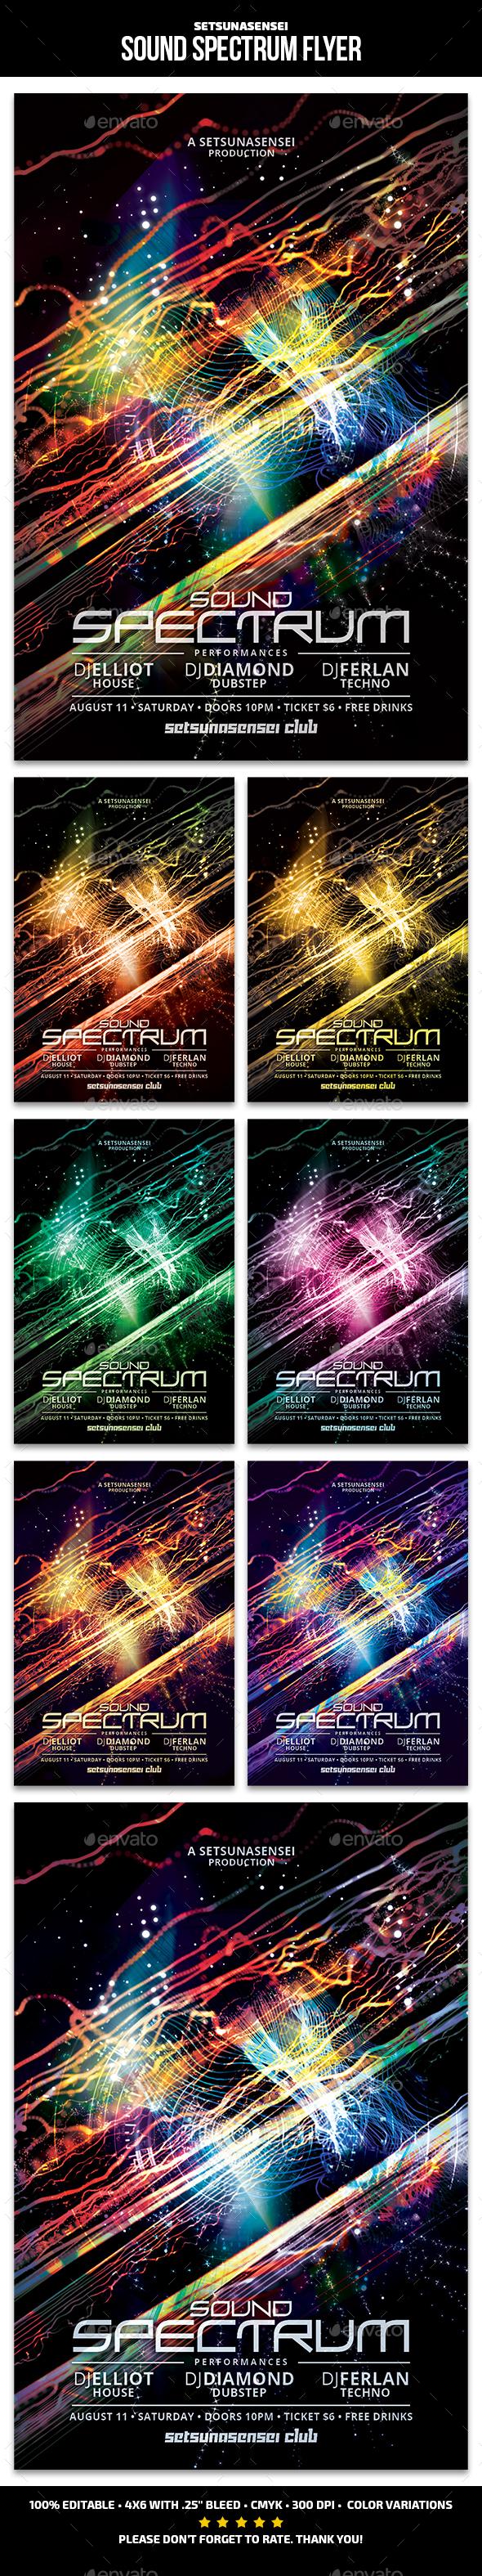 Sound Spectrum Flyer - Clubs & Parties Events